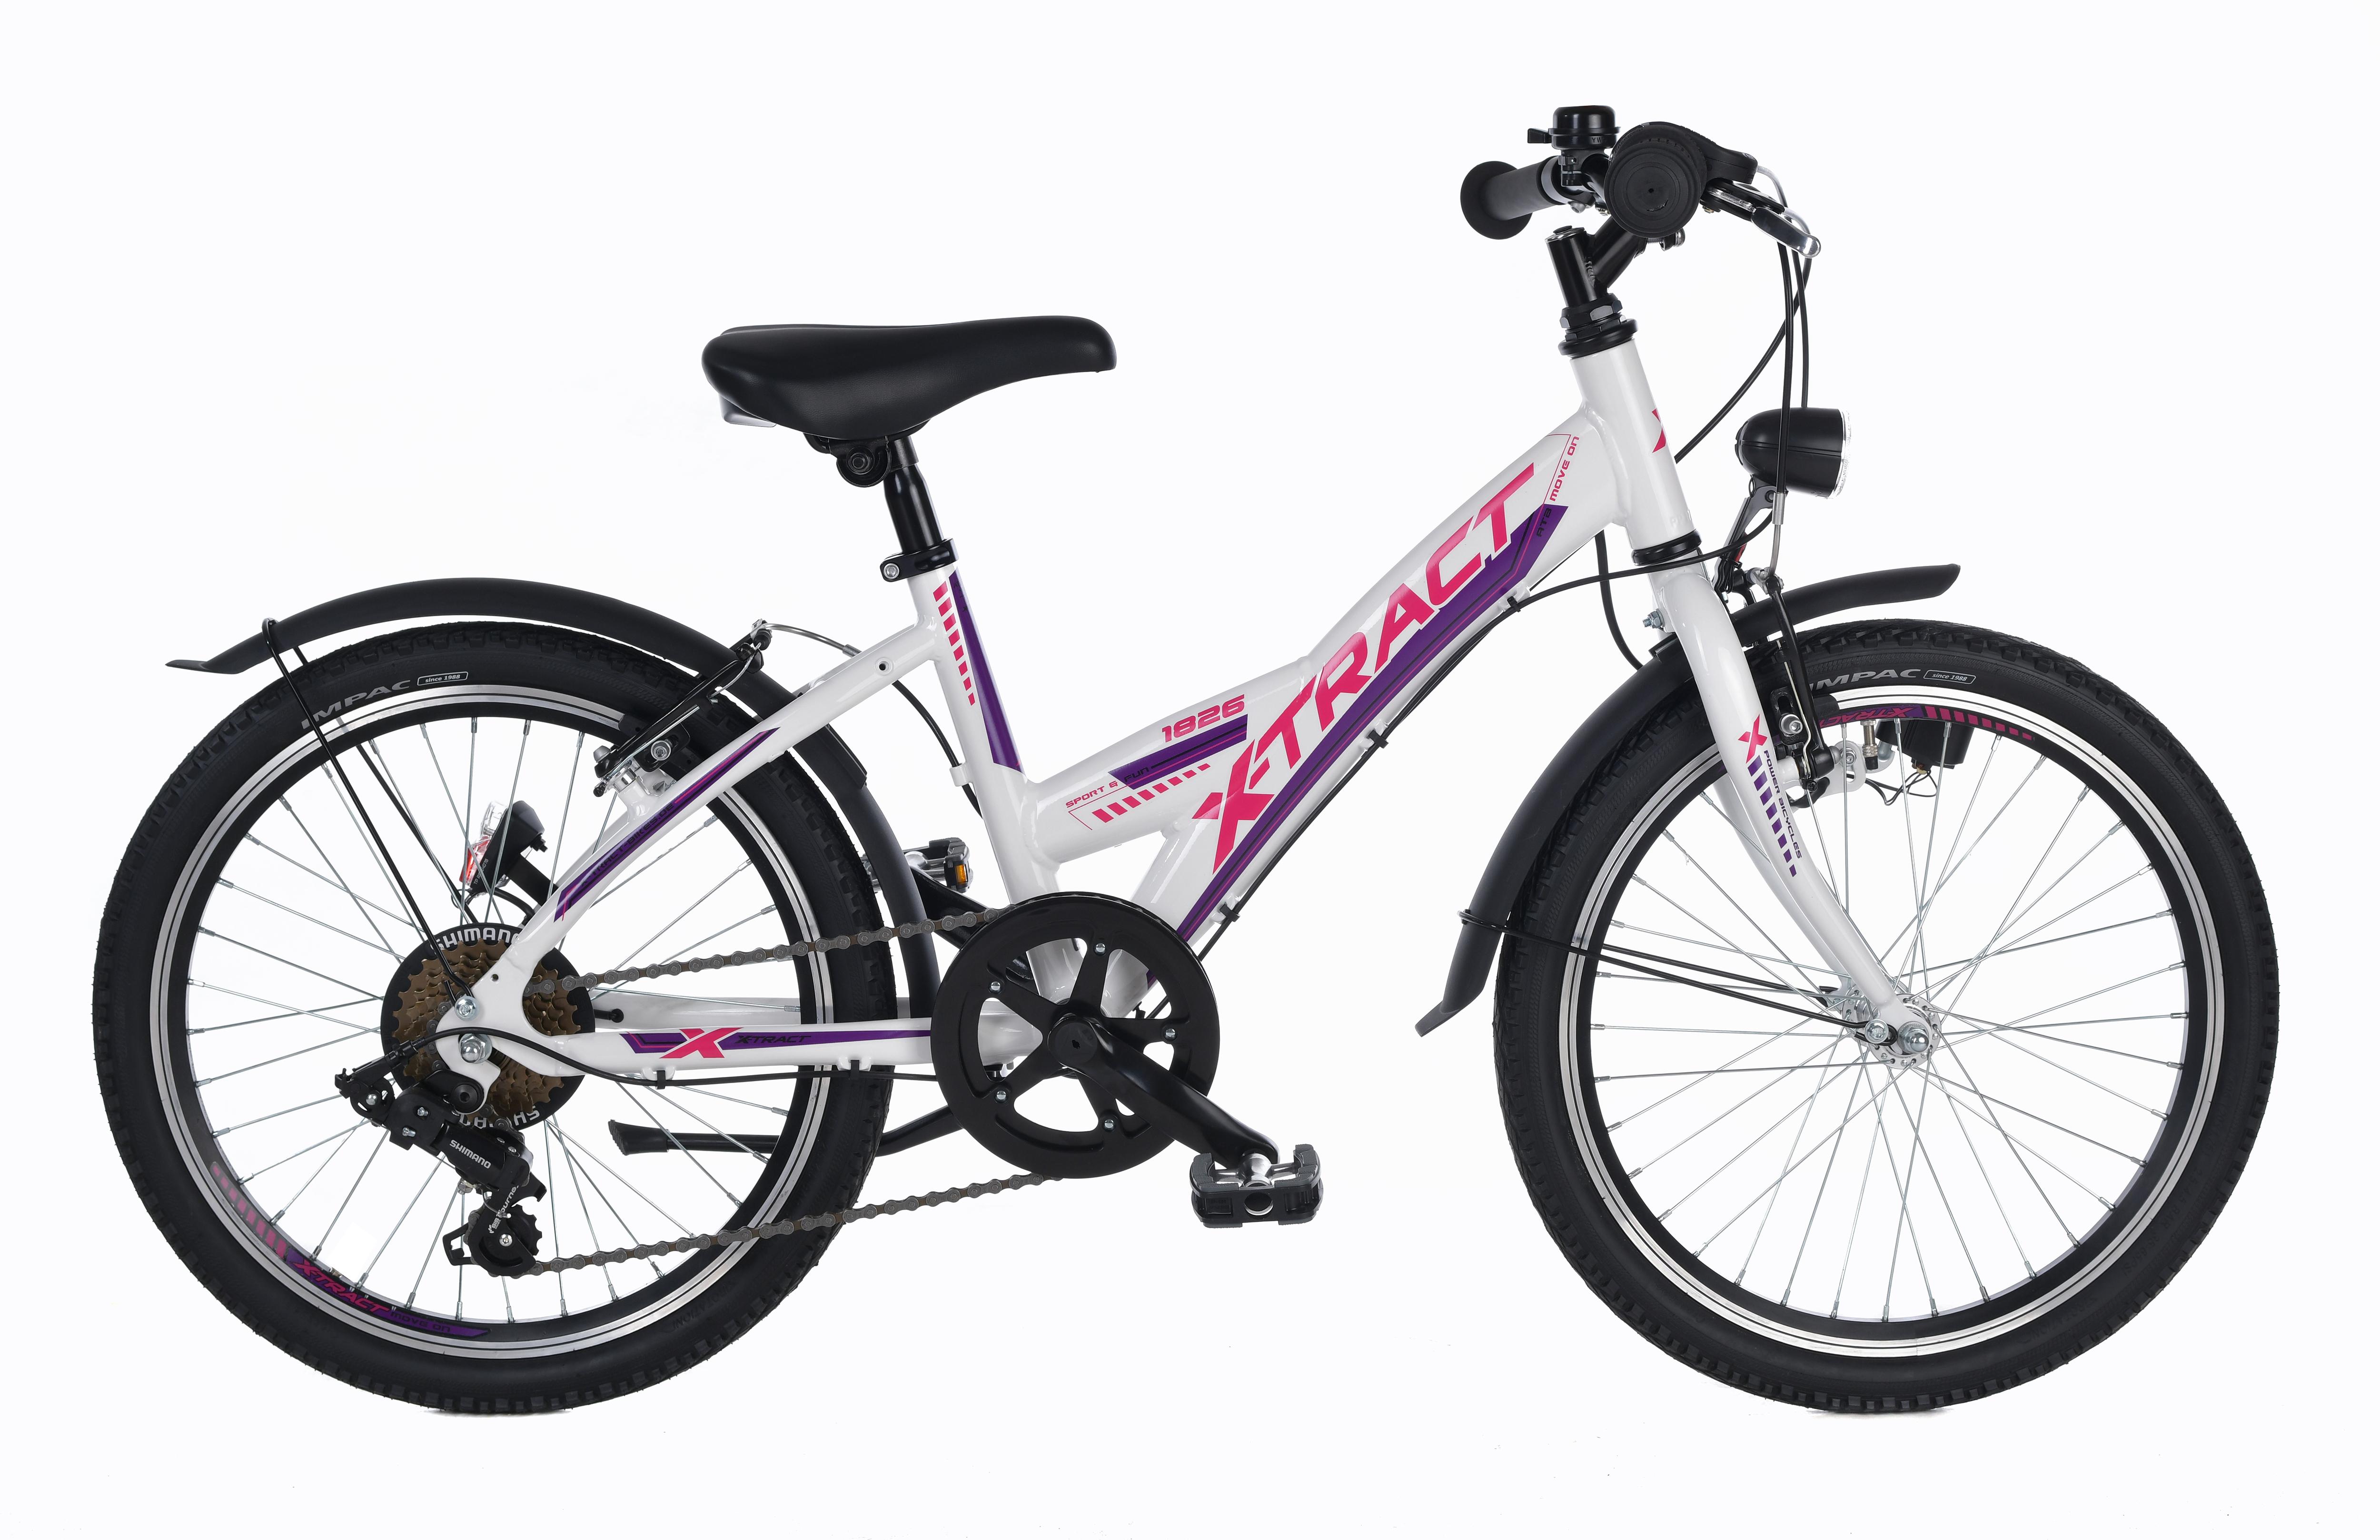 X Tract 1826 Feldmeier Bikes